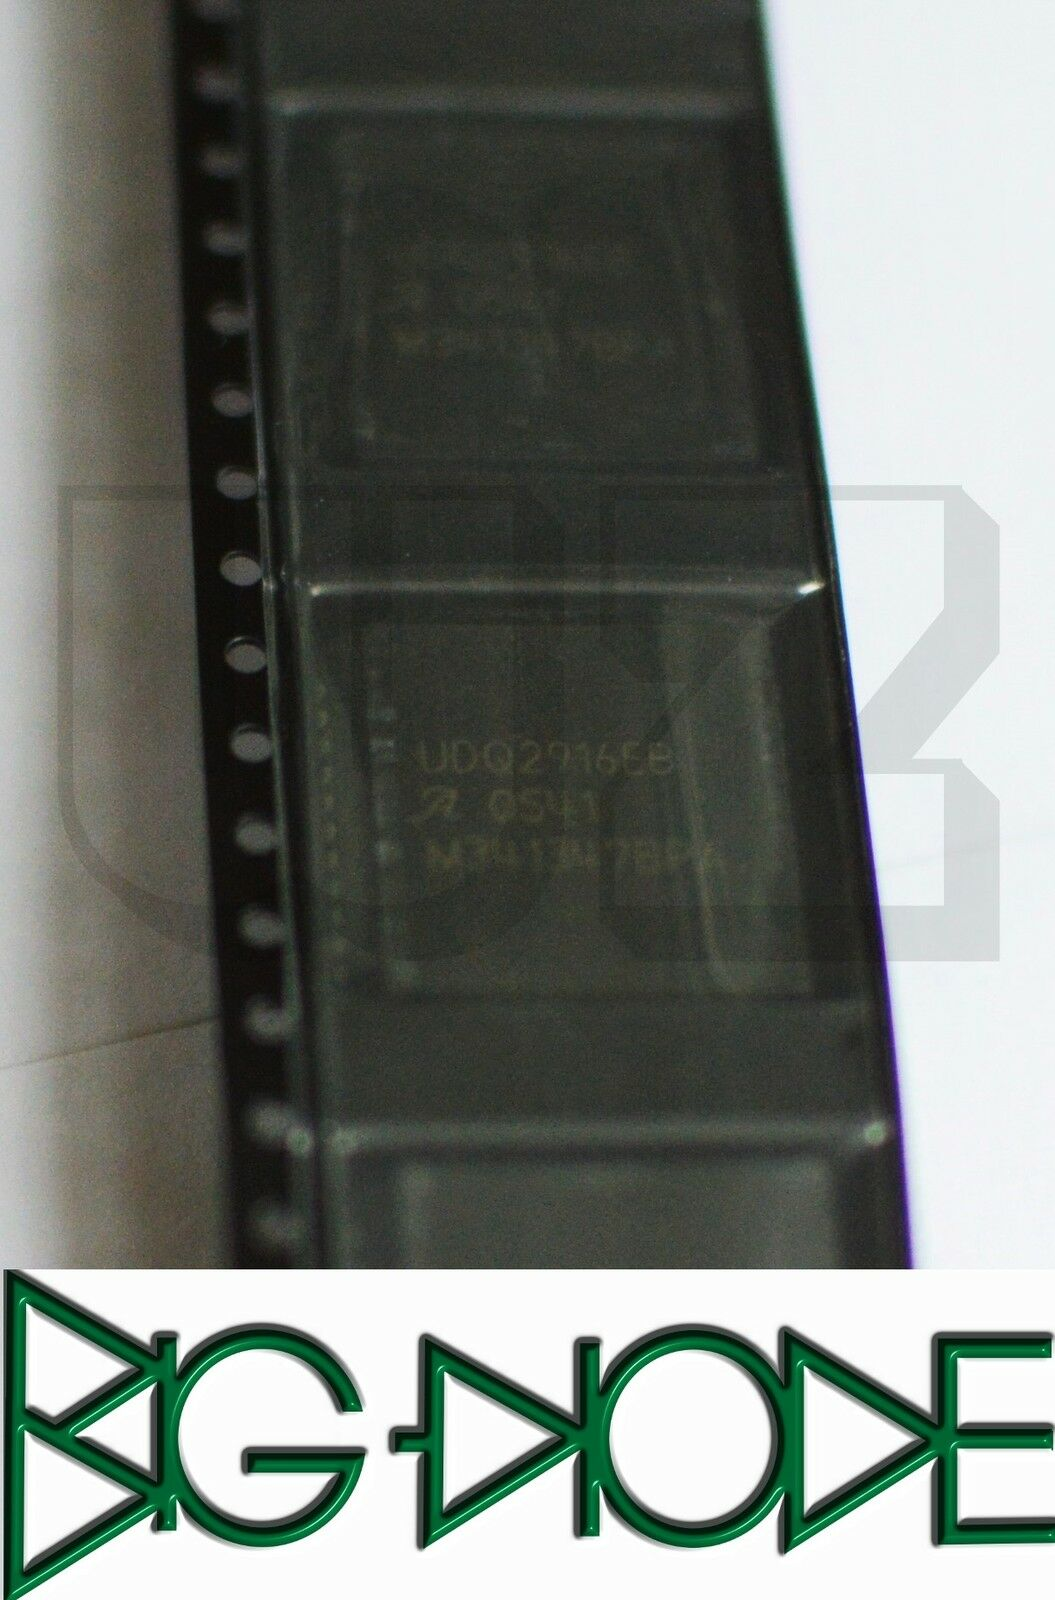 1PCS DUAL FULL-BRIDGE MOTOR DRIVER IC ALLEGRO SIP-12 UDN2998W